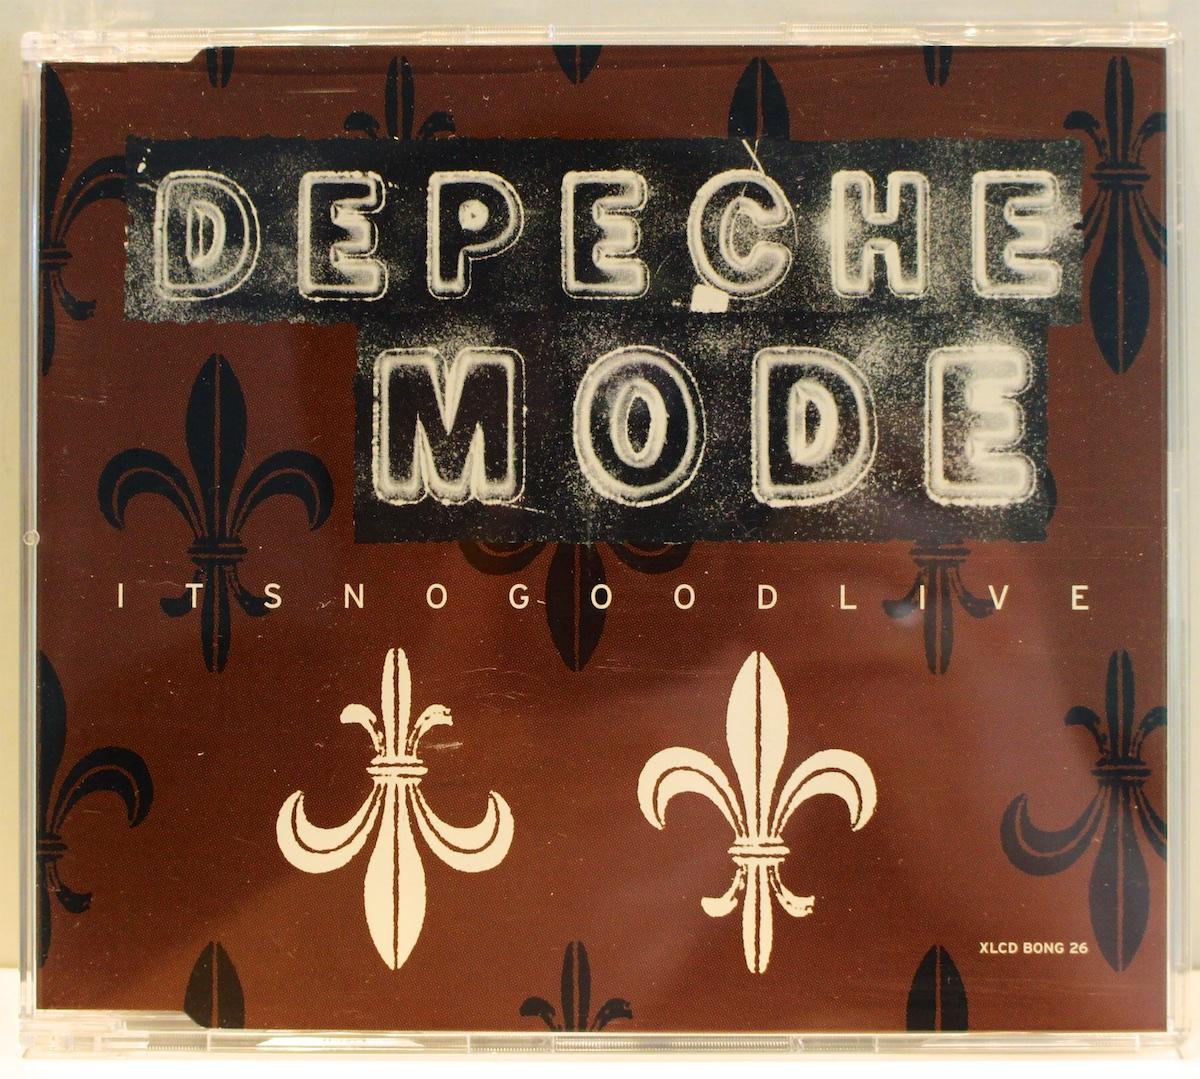 depeche mode it 39 s no good live uk promo cd mute xlcd bong 26 near mint ebay. Black Bedroom Furniture Sets. Home Design Ideas